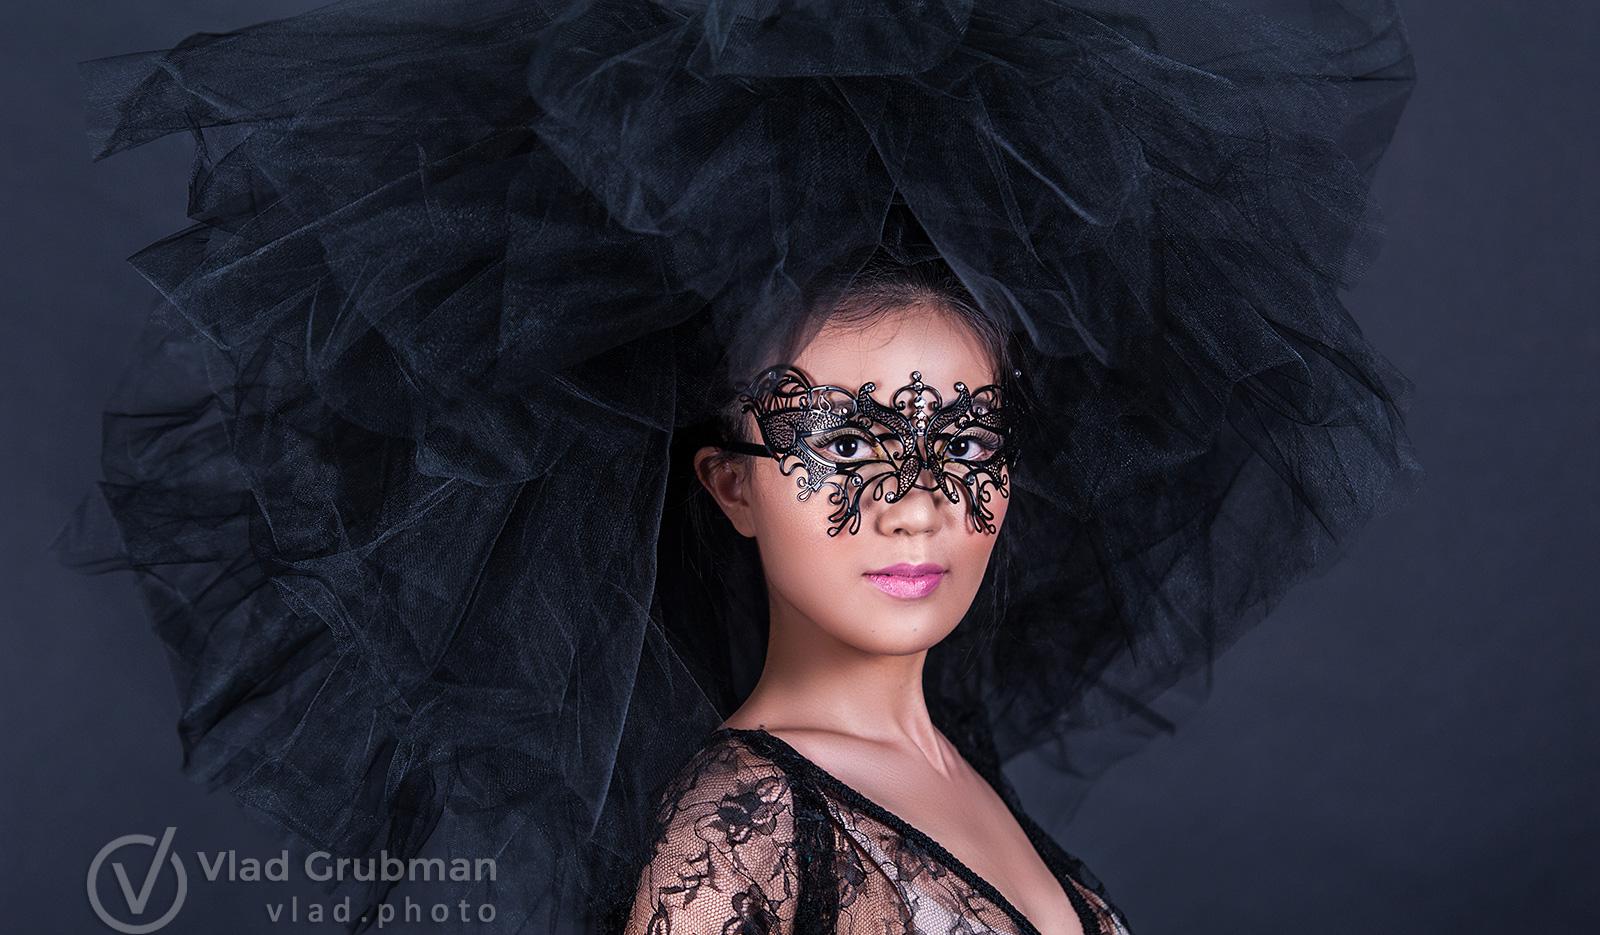 Headshot in the mask for fashion designer - Photography by Vlad Grubman / Zealusmedia.com